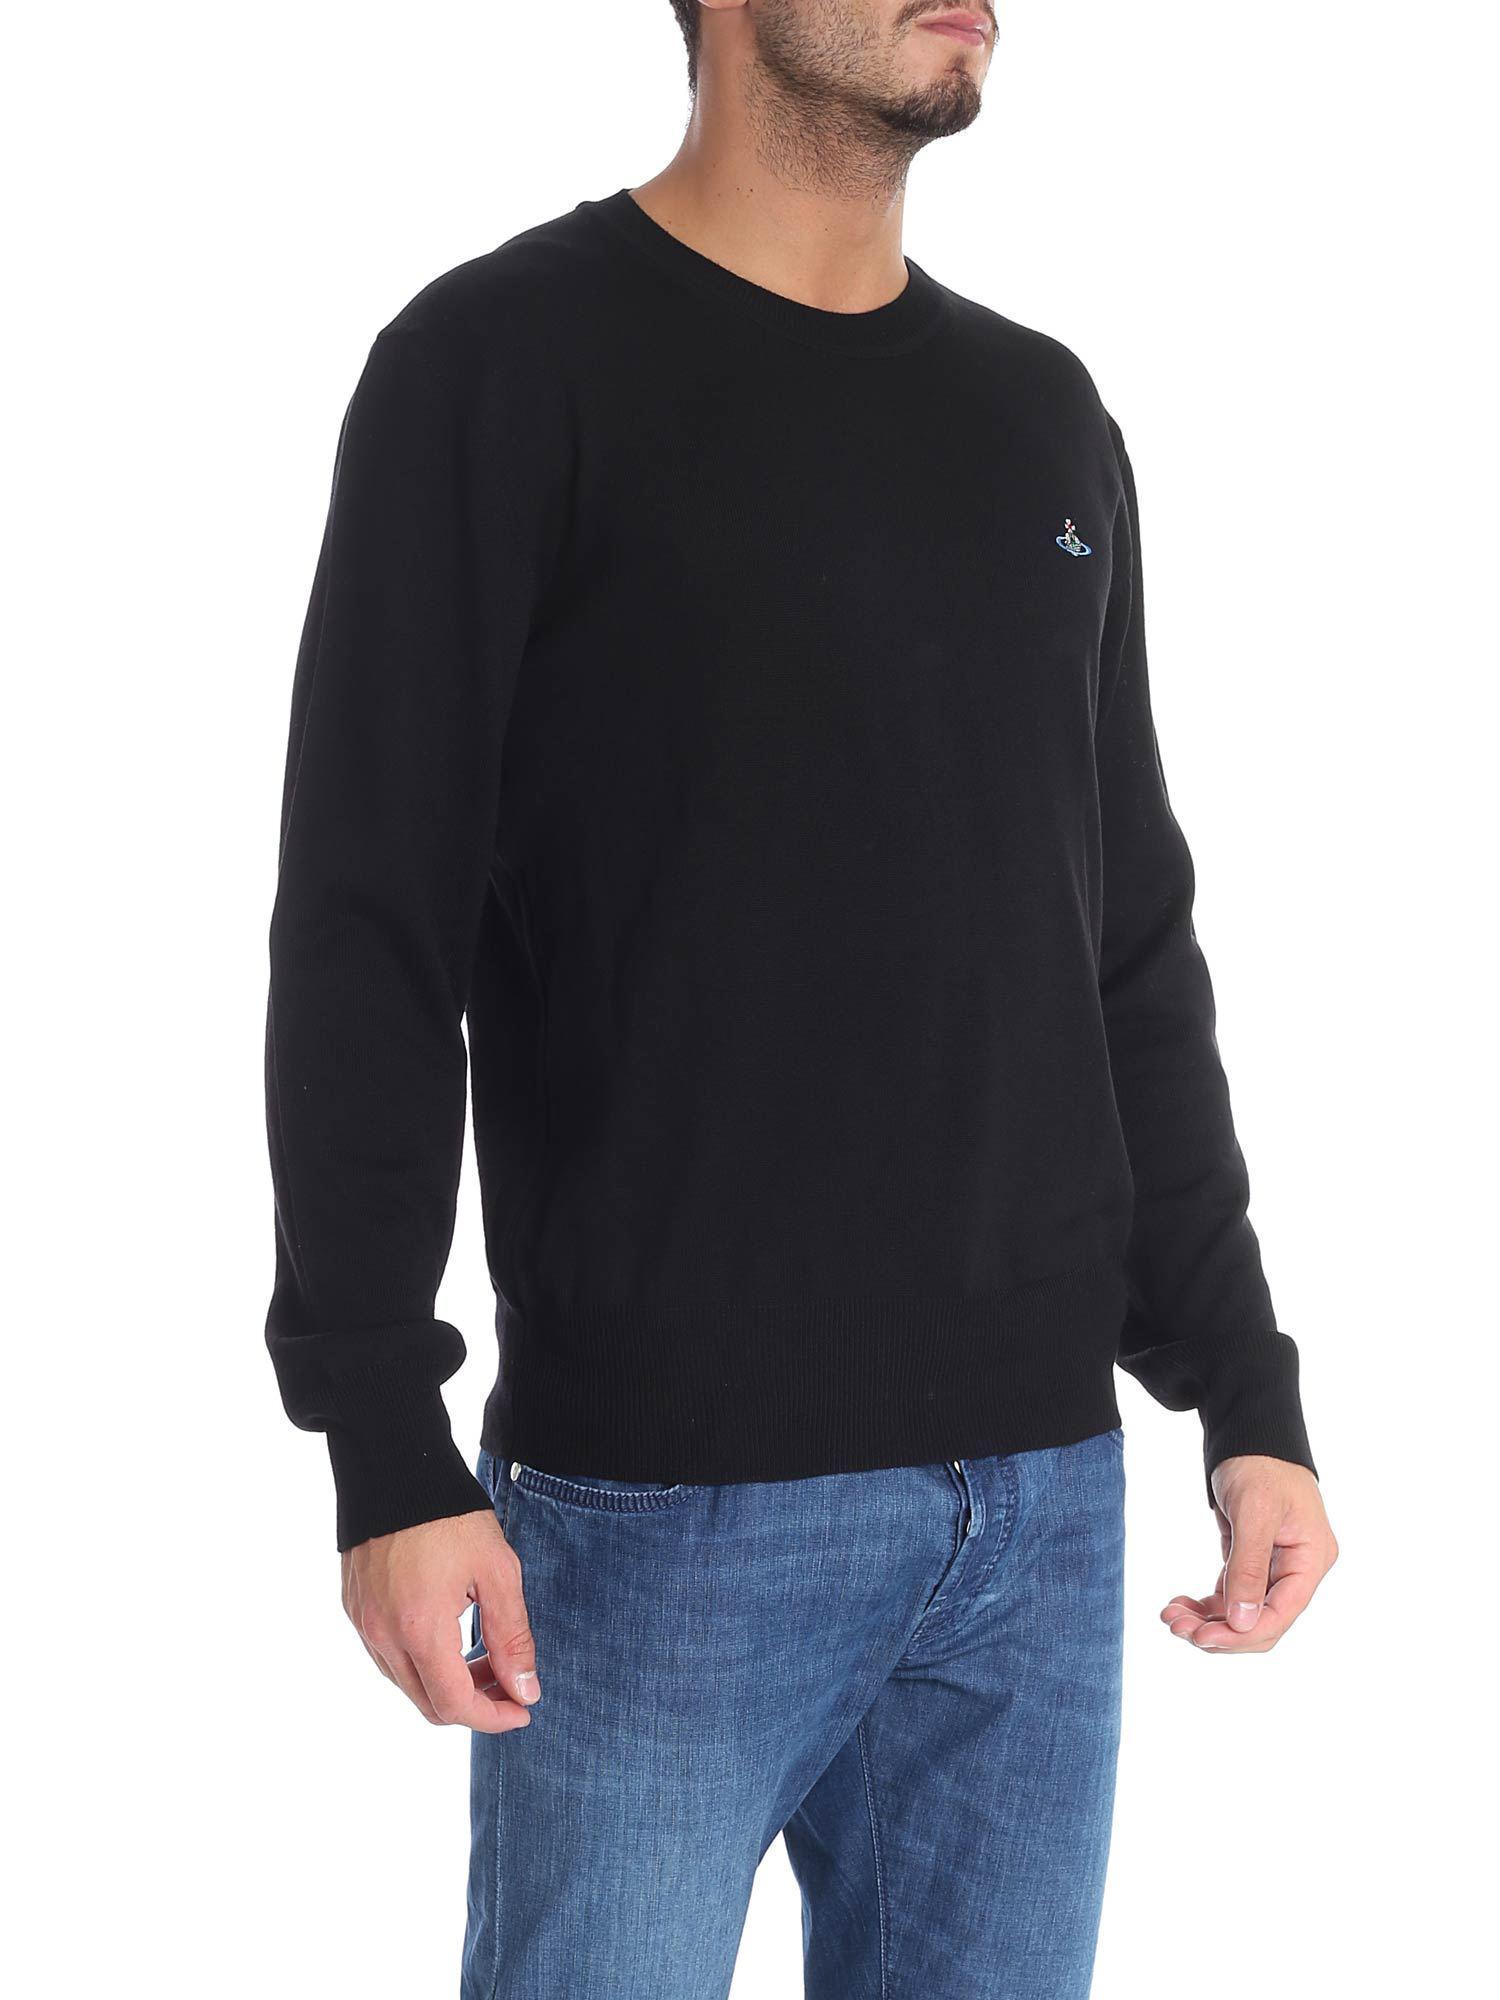 2de0bc47dea05 Vivienne Westwood Black Pullover With Logo in Black for Men - Save  13.245033112582774% - Lyst